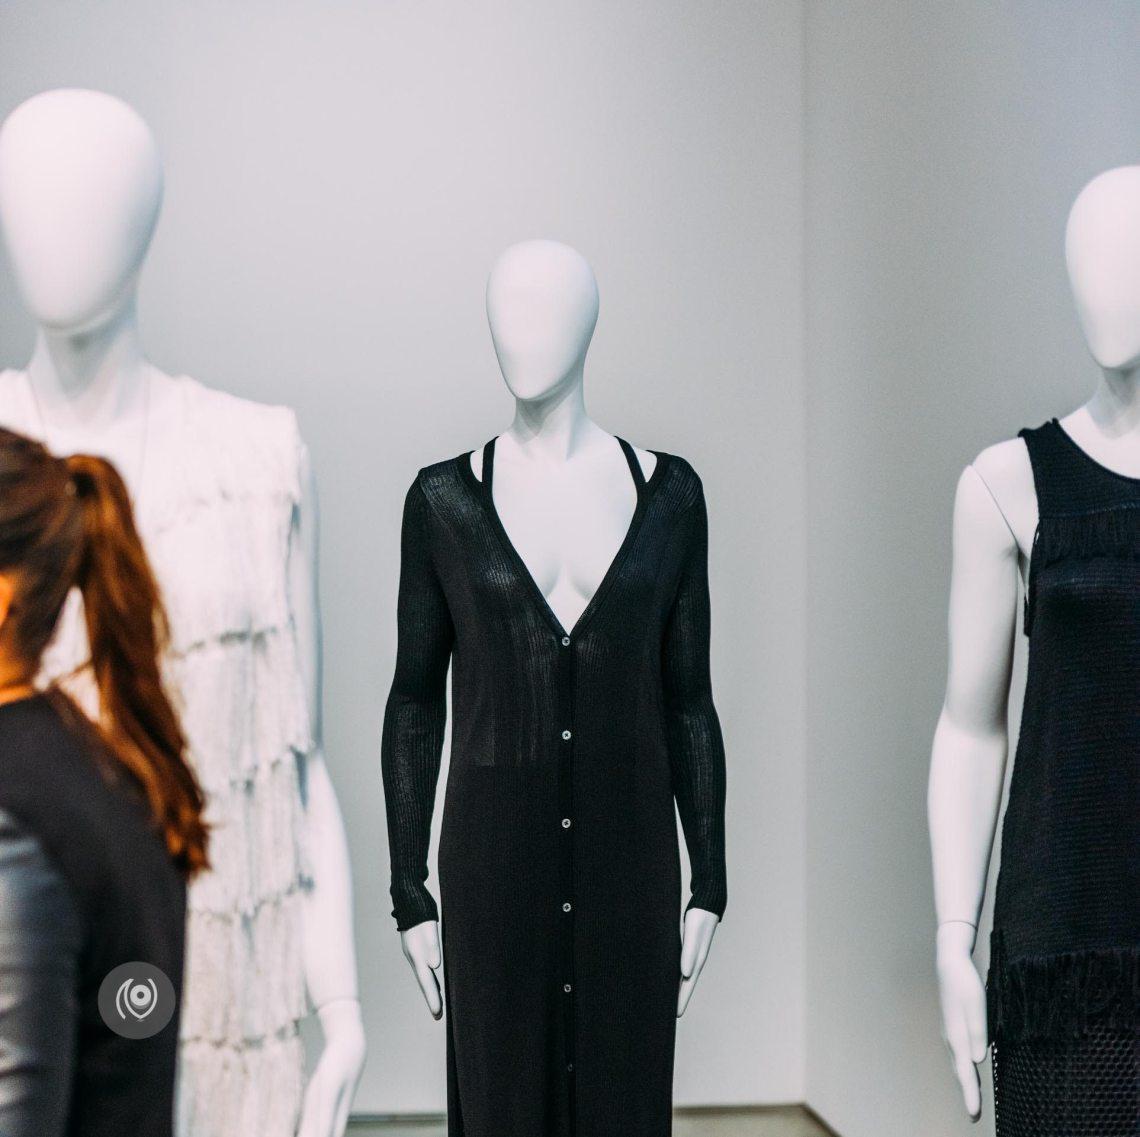 Tess Giberson, SS16, NYFW, New York Fashion Week, #EyesForNewYork #REDHUxNYC Naina.co Luxury & Lifestyle, Photographer Storyteller, Blogger